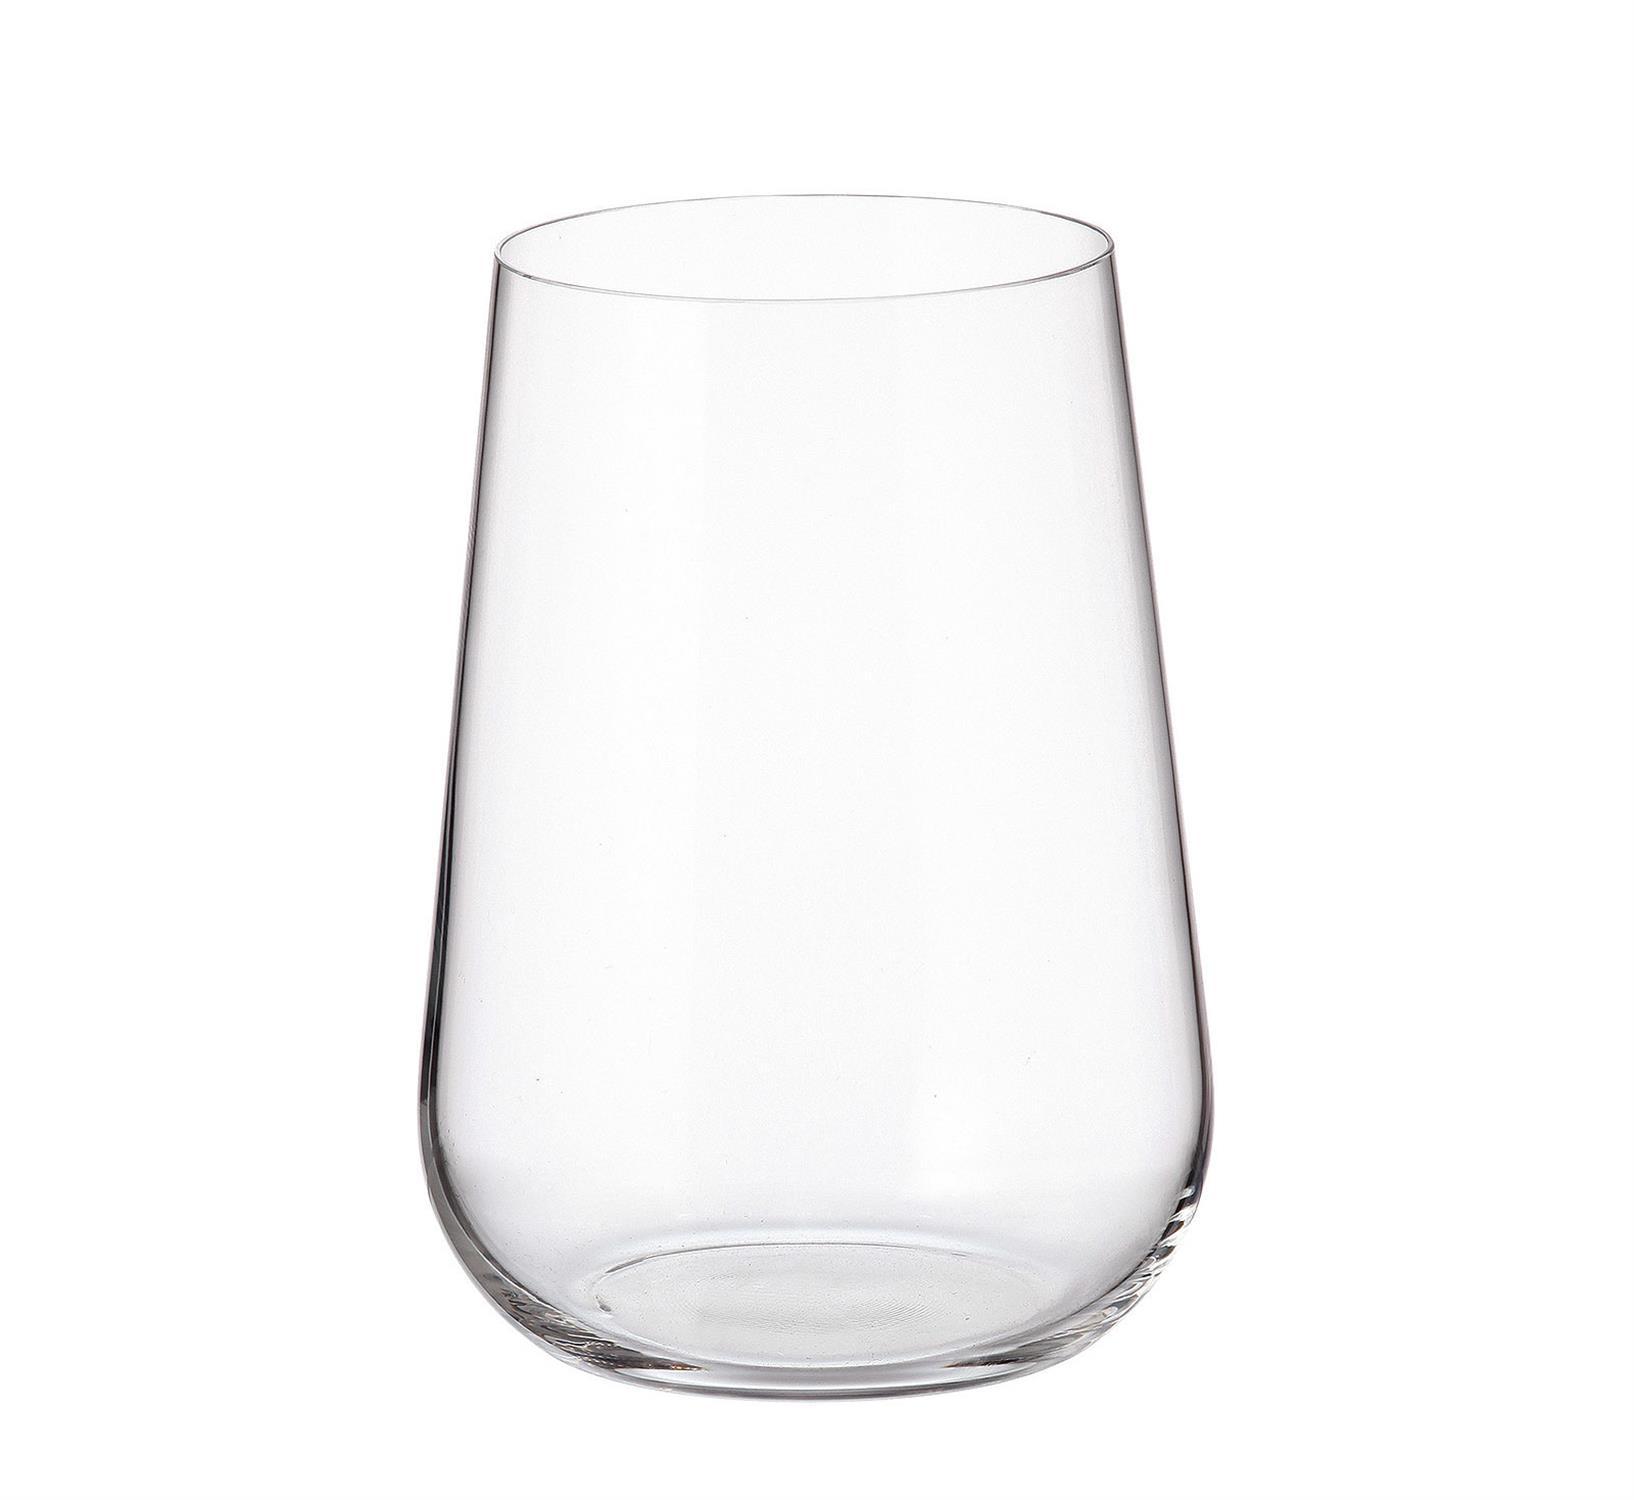 S/6 Ποτήρι σωλήνα Amundsen κρυστάλλινο διάφανο 470ml 9.1×12.7cm Bohemia